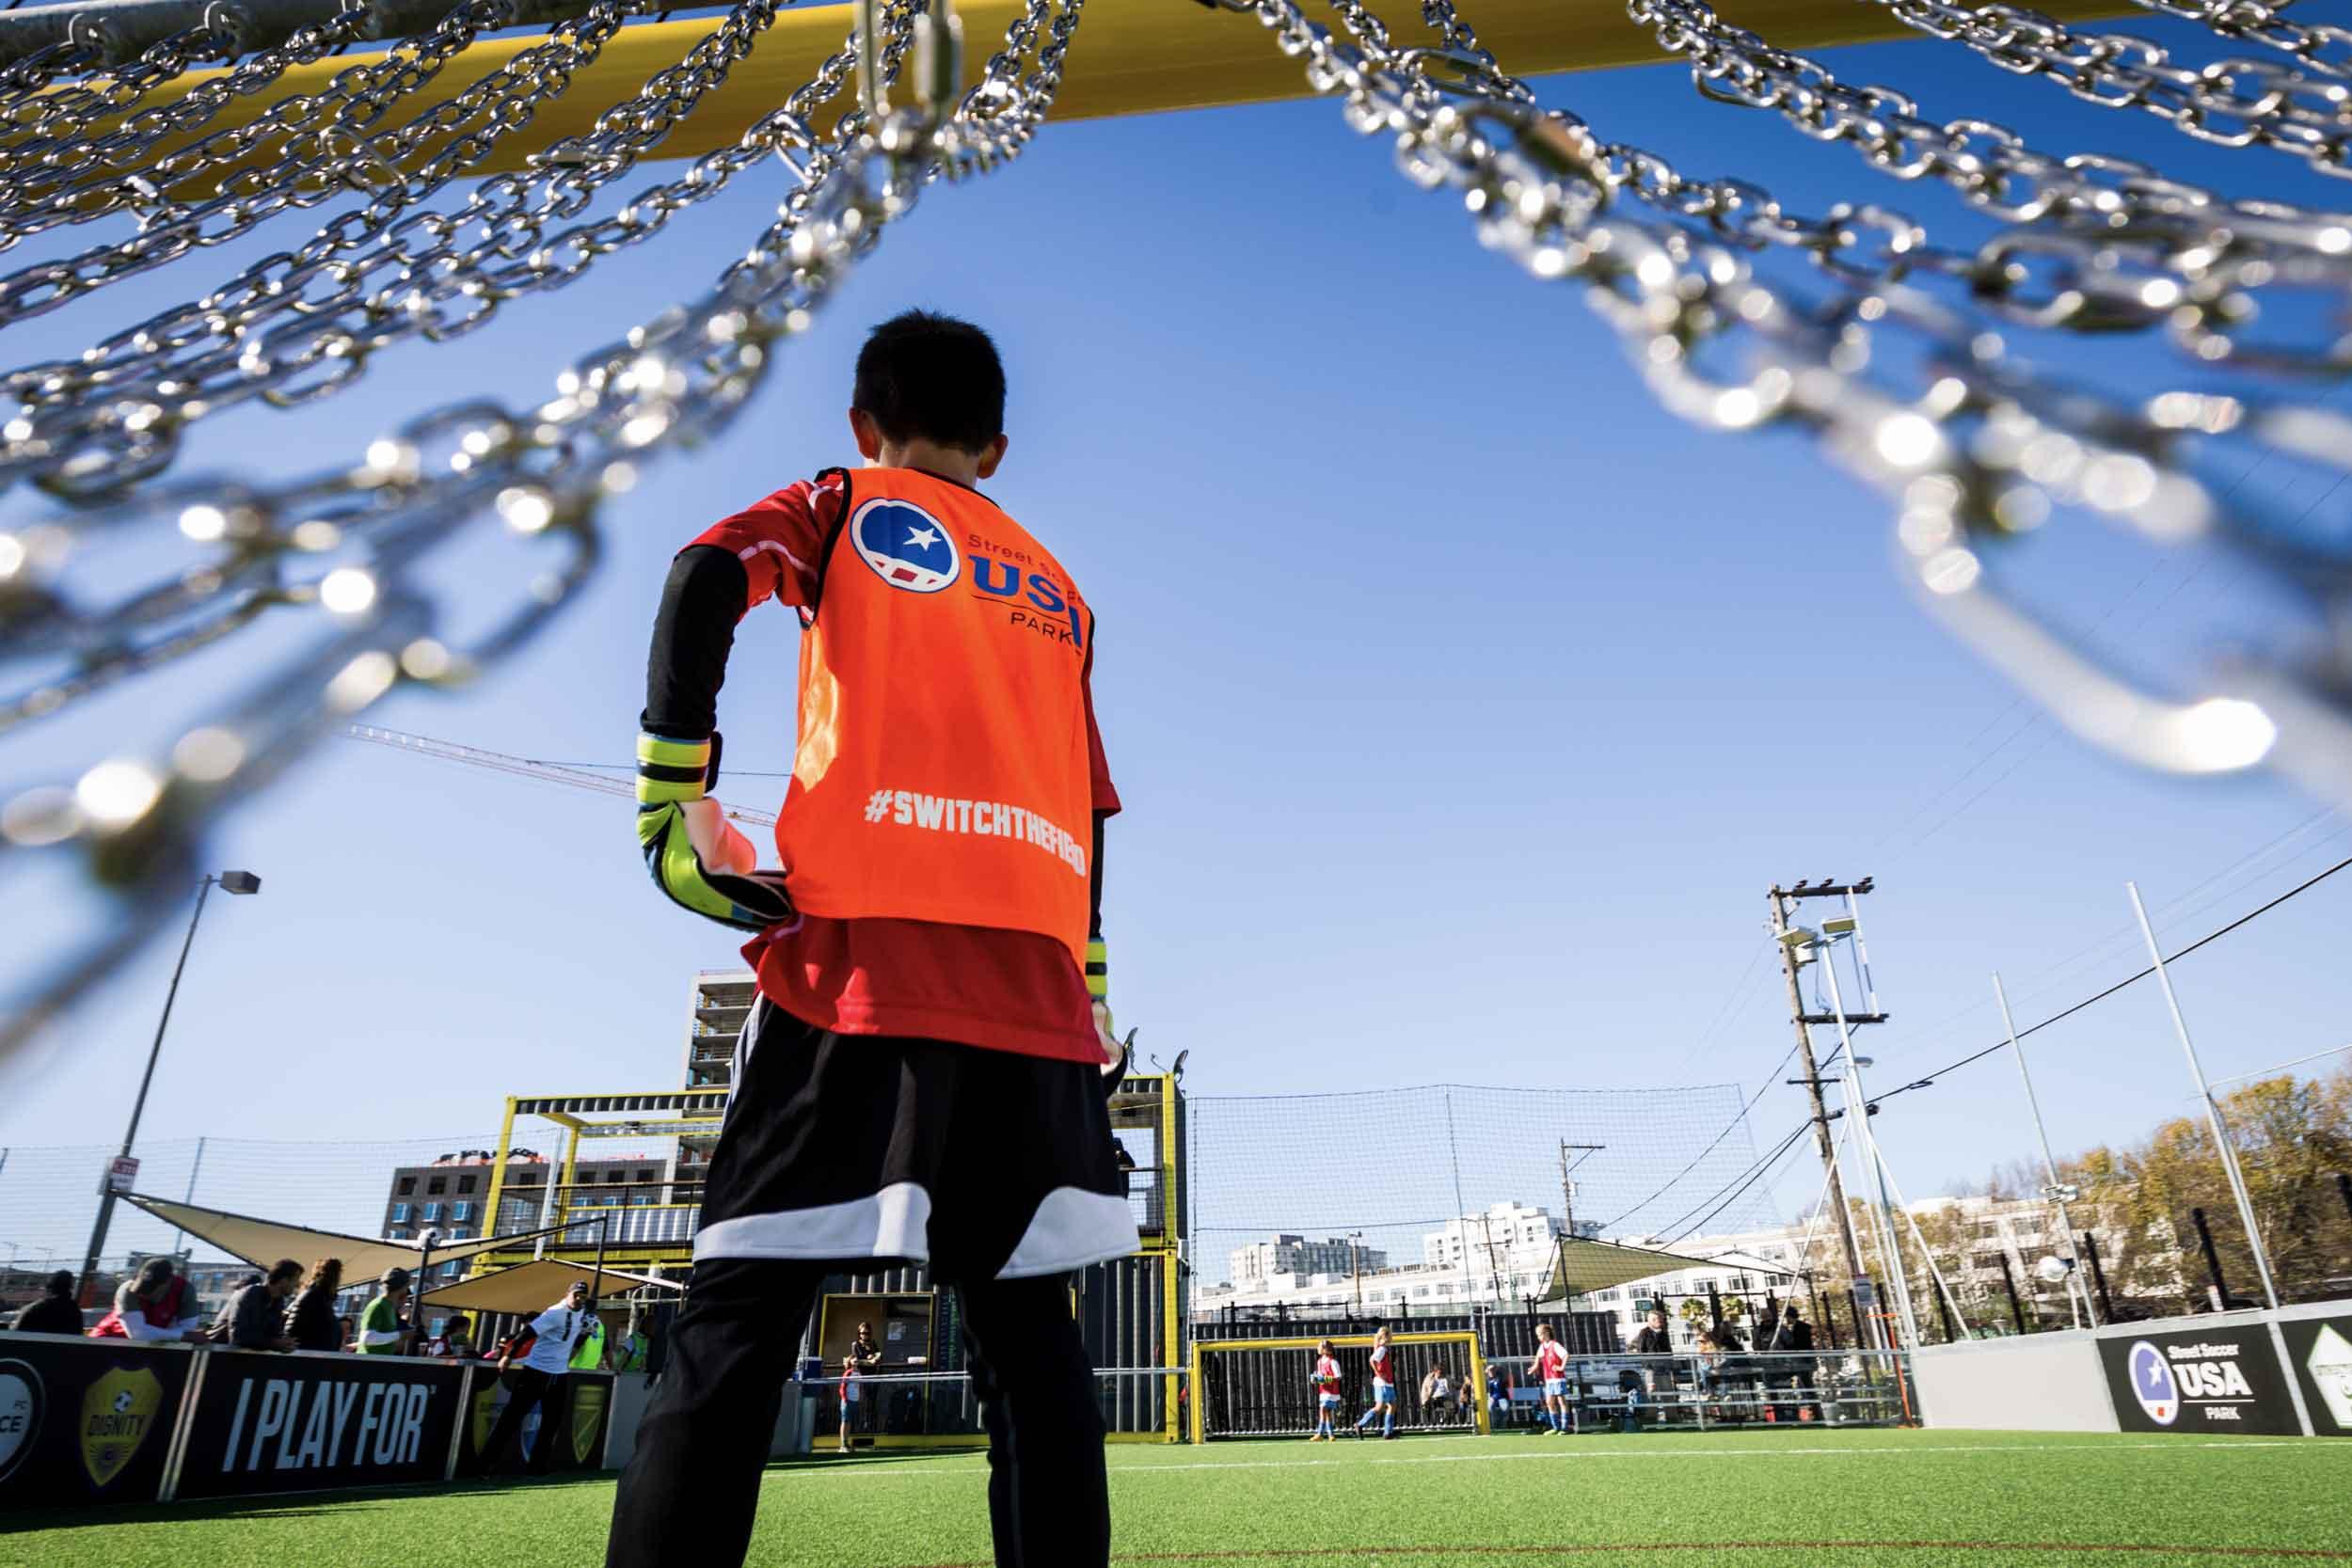 Back view of kid goalie on soccer field in San Francisco.